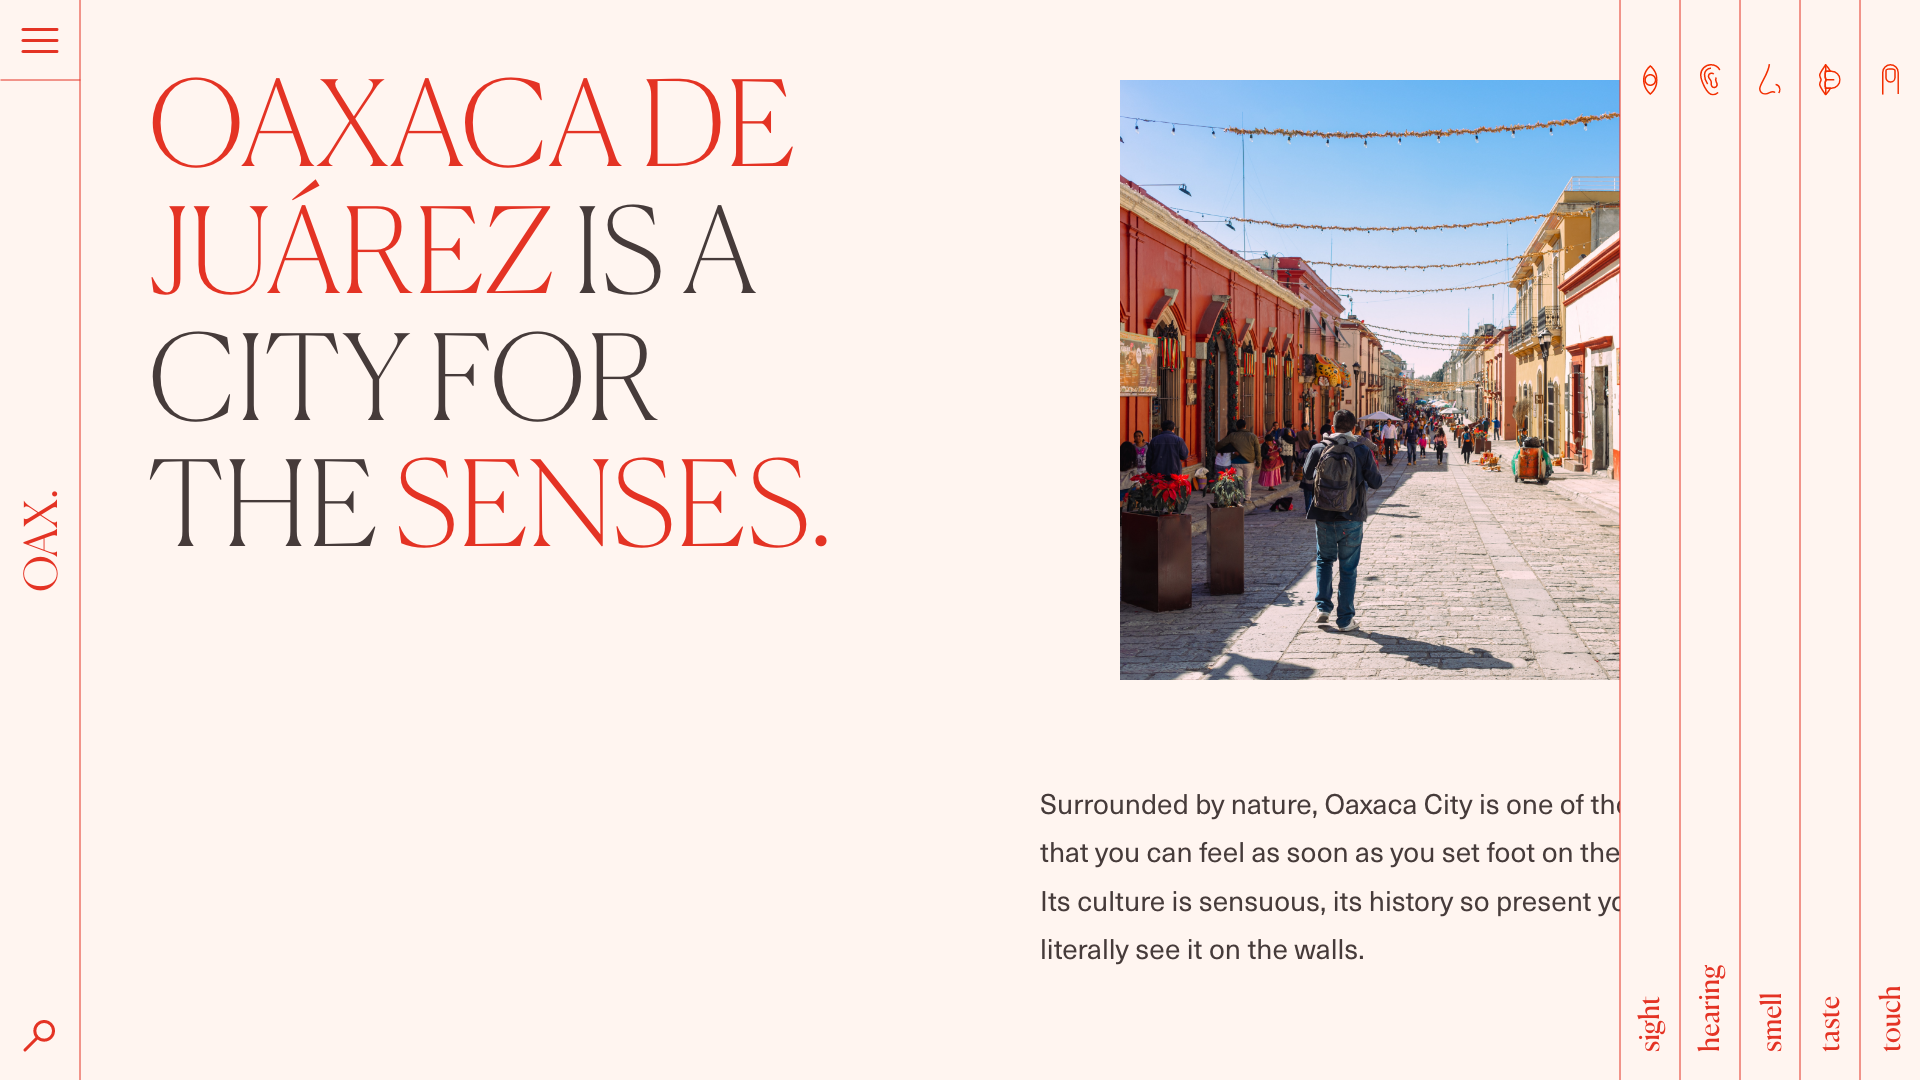 Desktop view of Oaxaca website